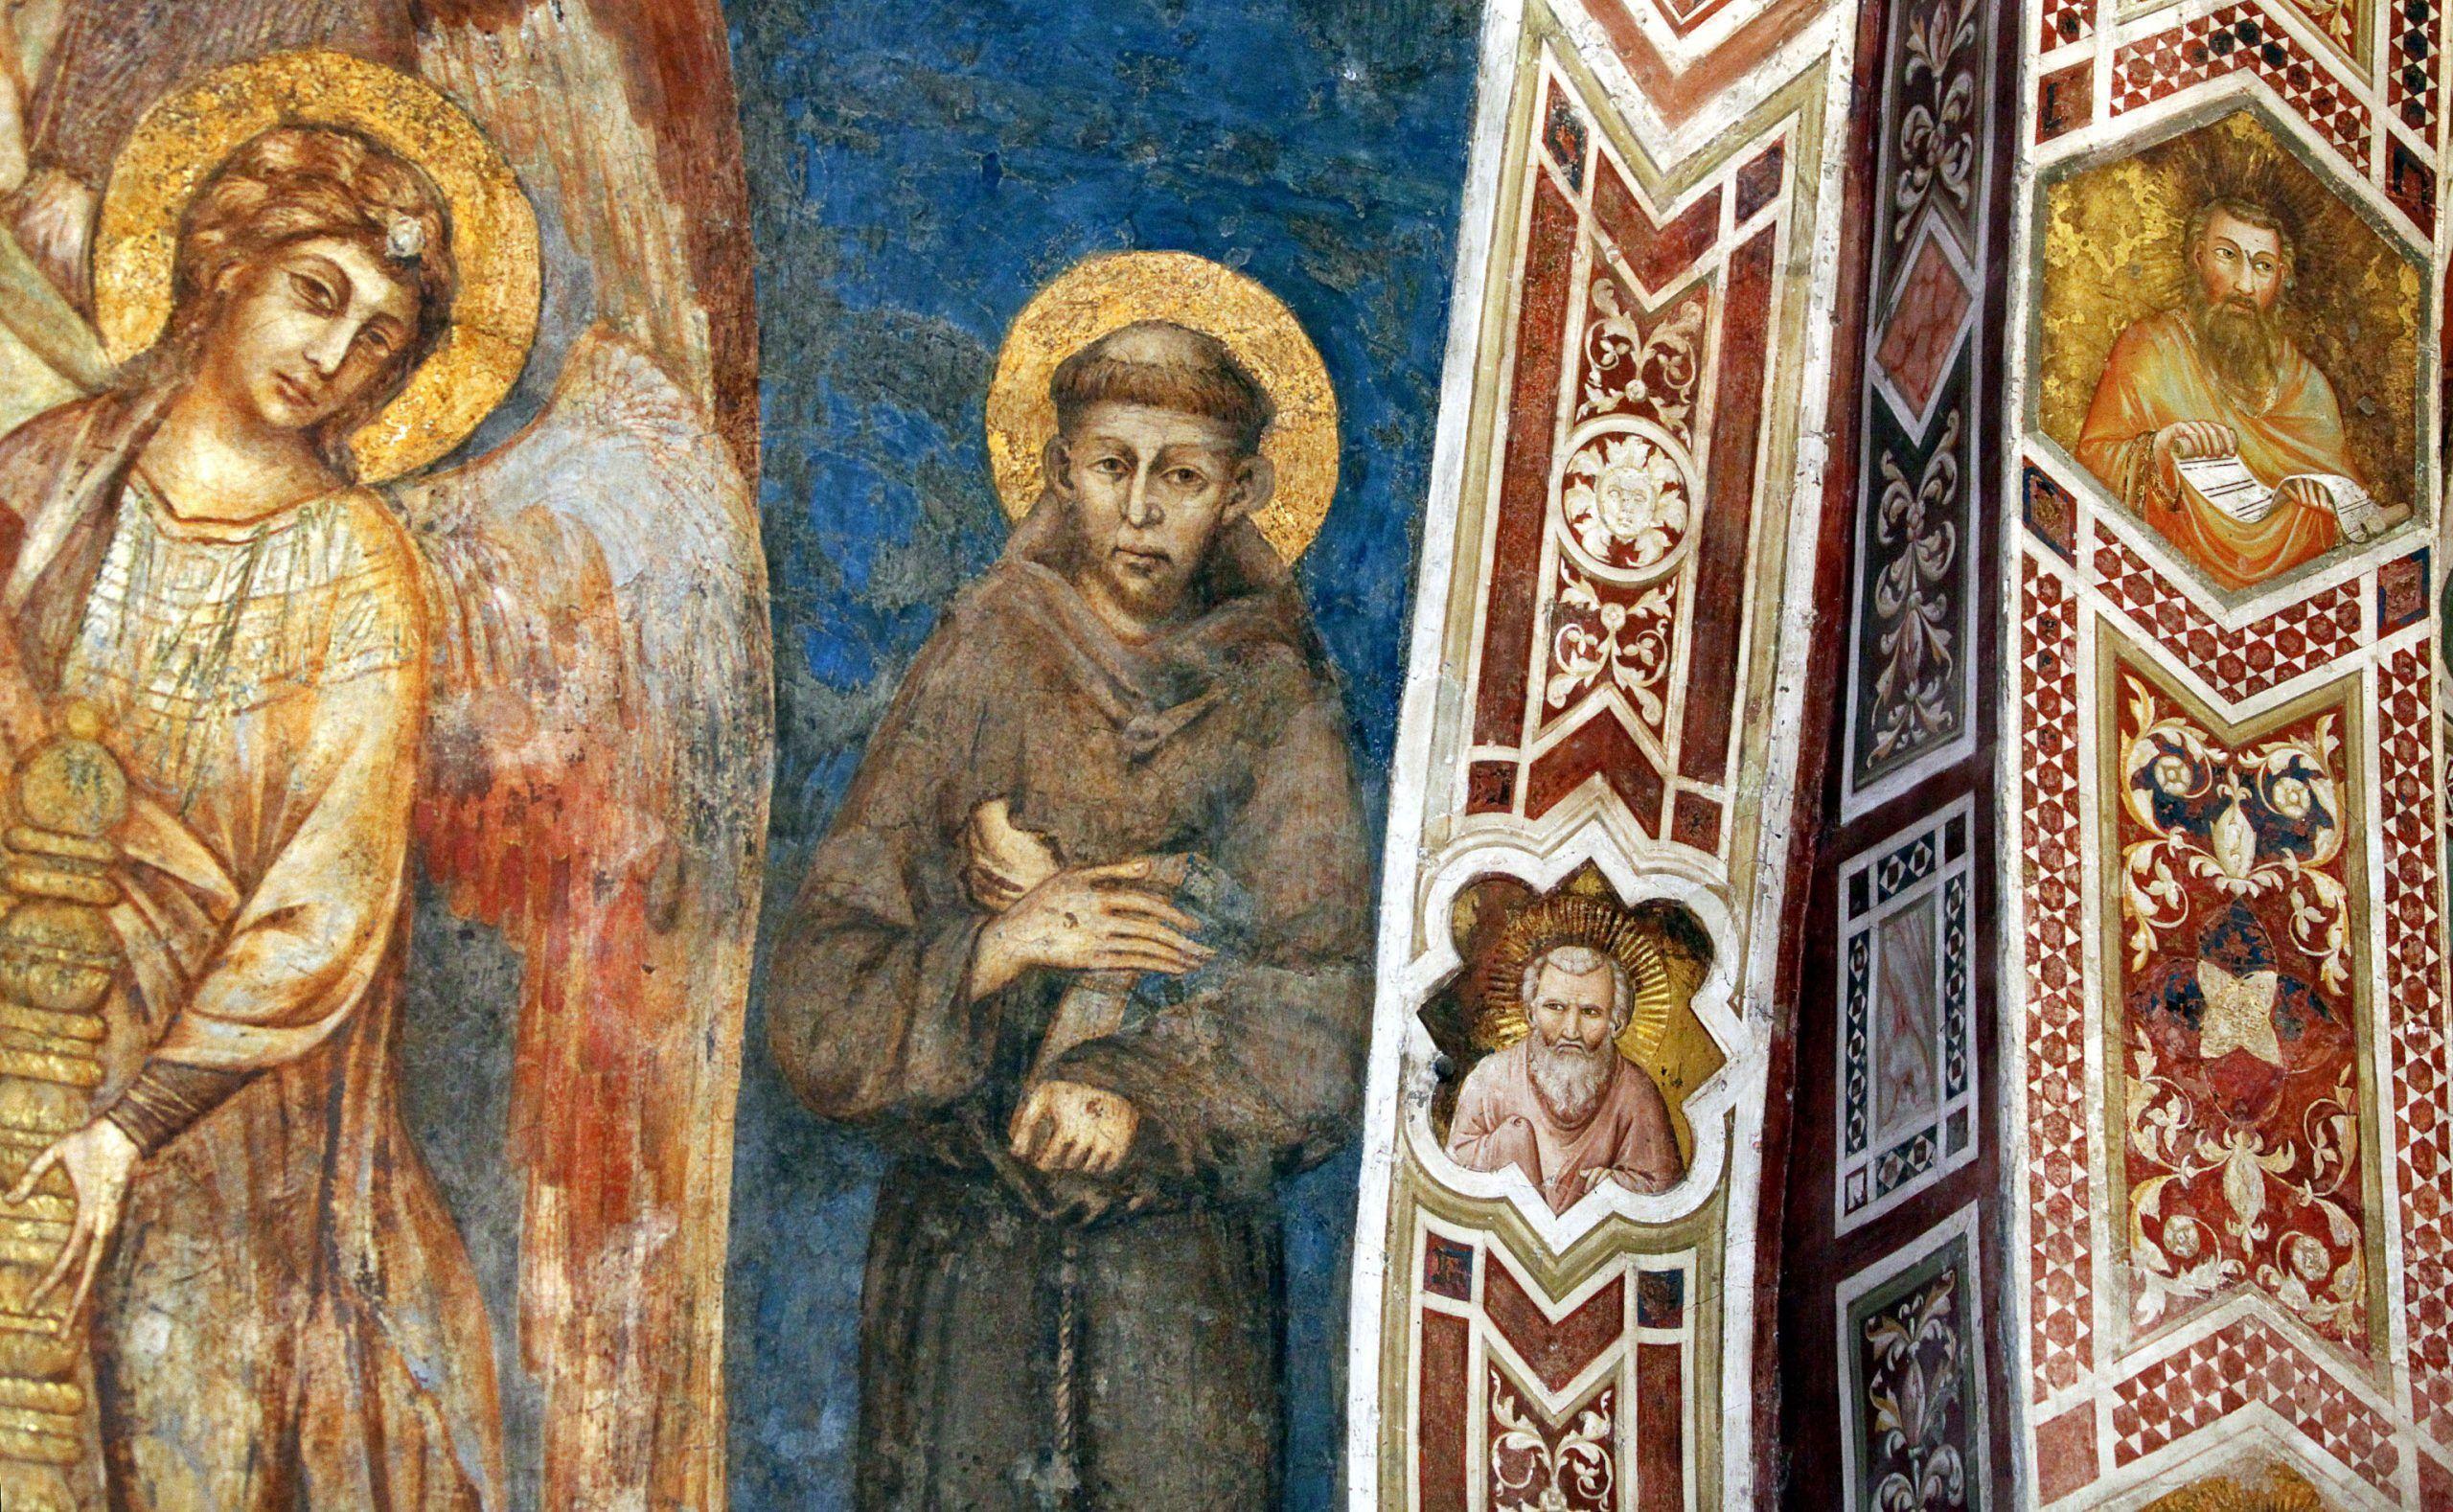 San-Francesco-dAssisi-Cimabue-Sacro-Convento-di-S.-Francesco-Assisi